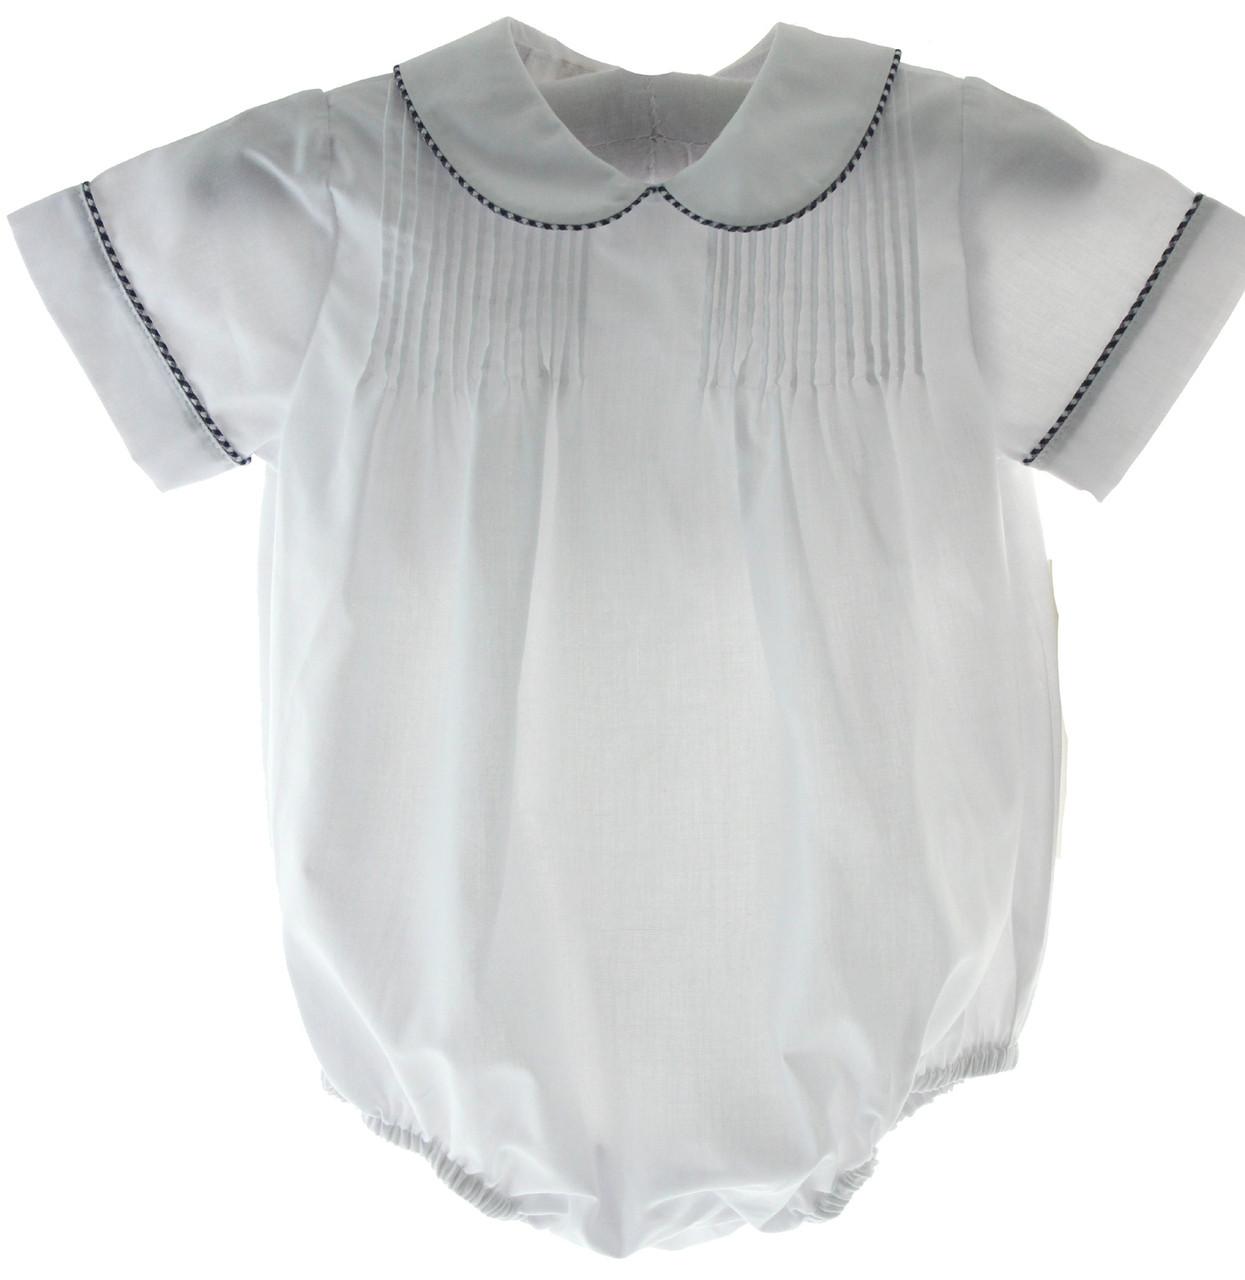 ca231b090 Boys White Bubble Outfit Peter Pan Collar Navy Blue Trim | Rosalina ...